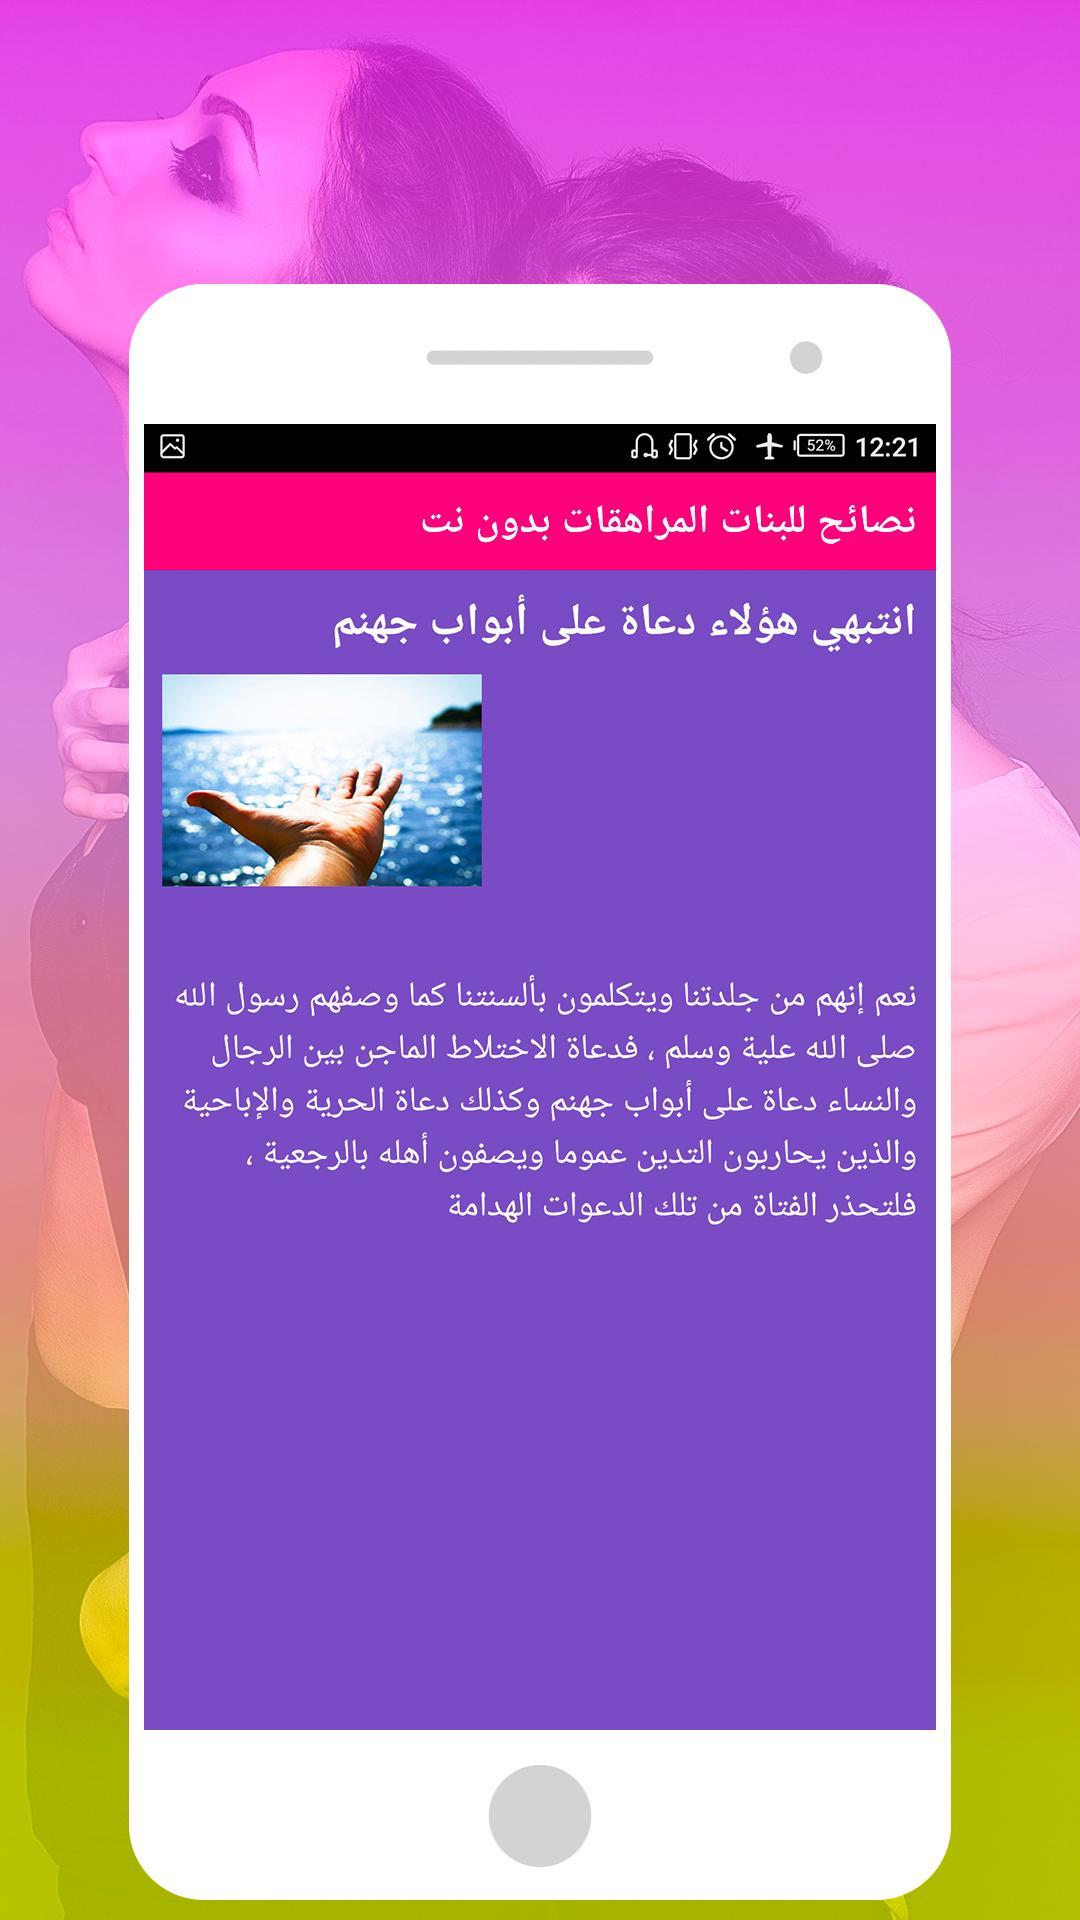 701f265f7 نصائح للبنات المراهقات بدون نت for Android - APK Download